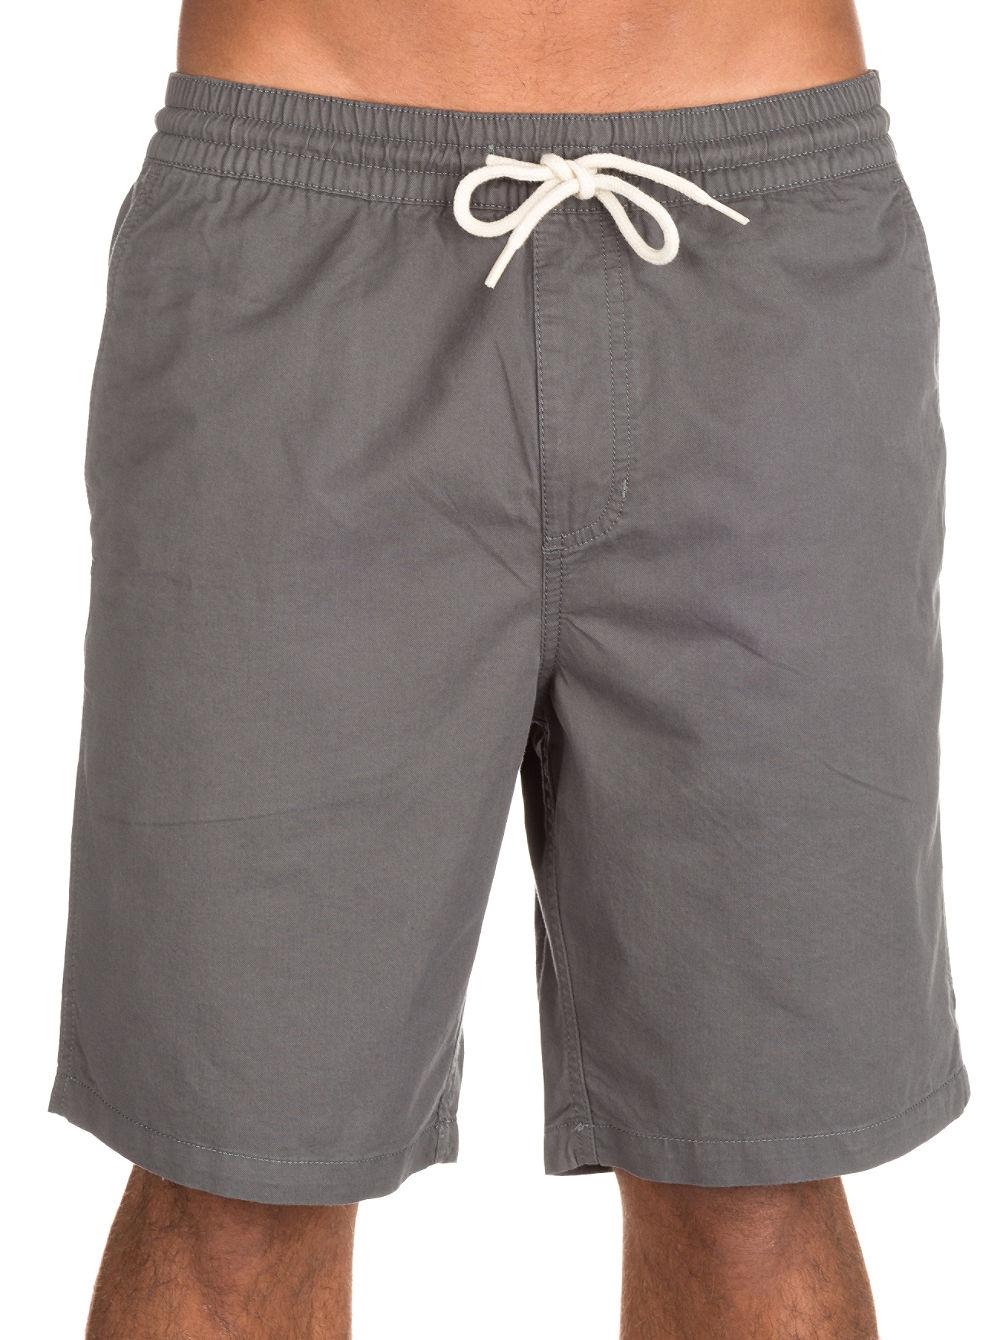 5e935c9b847197 Buy Vans Range Shorts online at Blue Tomato